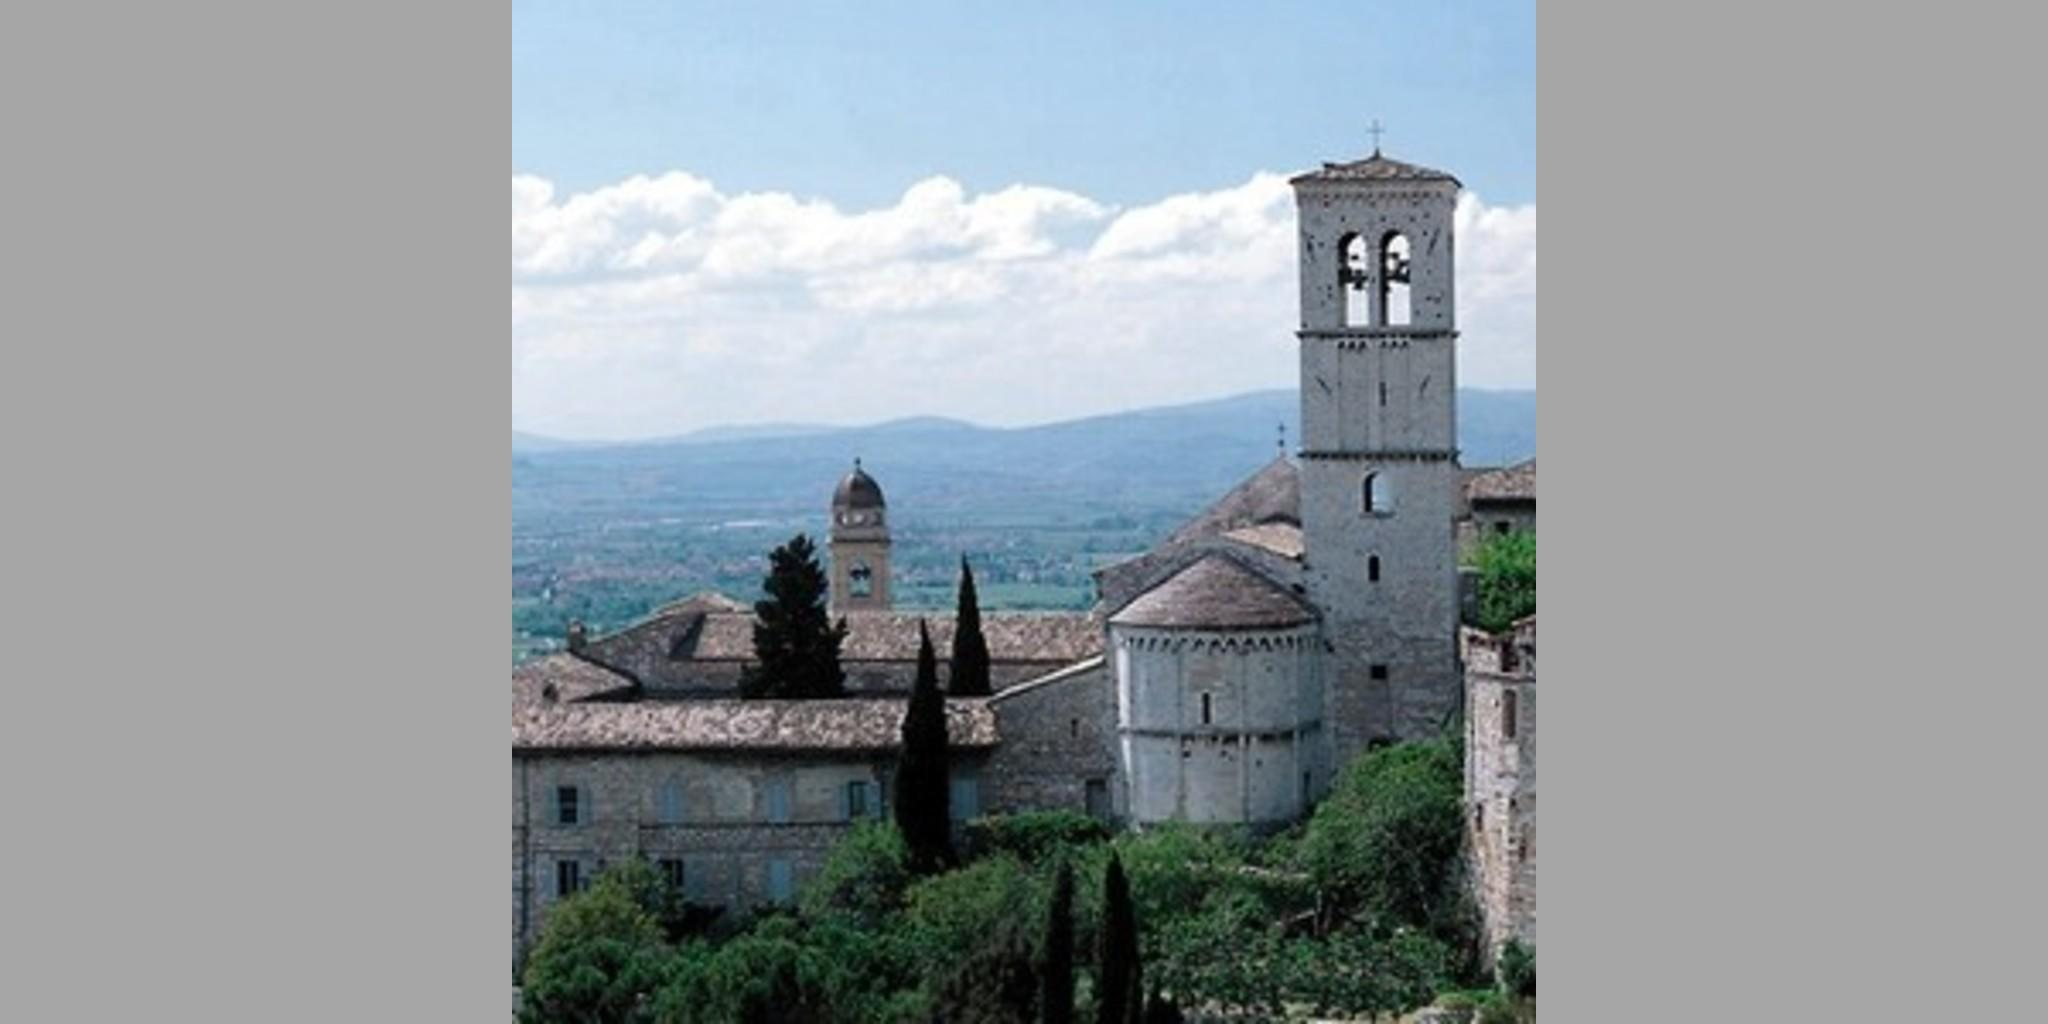 Hotel Assisi - San Crispino